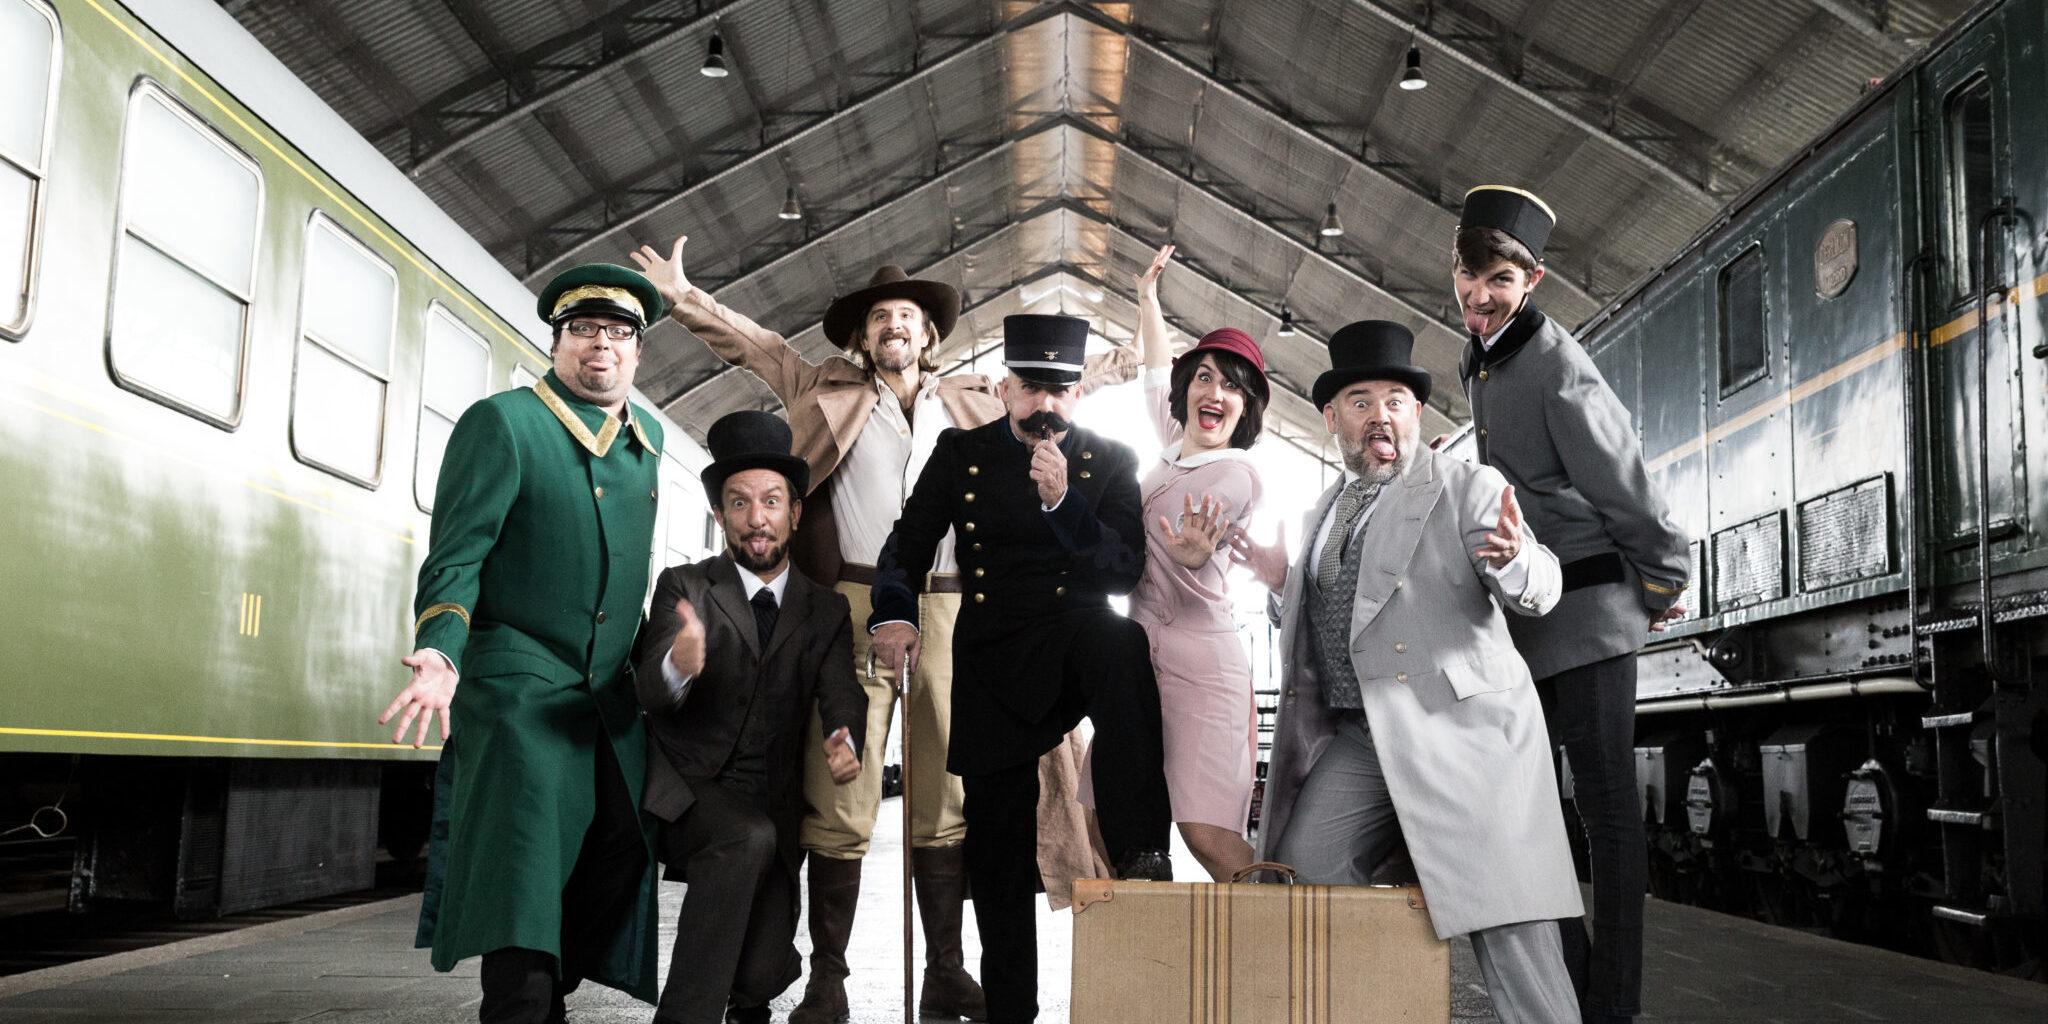 El Misterio del Museo del Ferrocarril